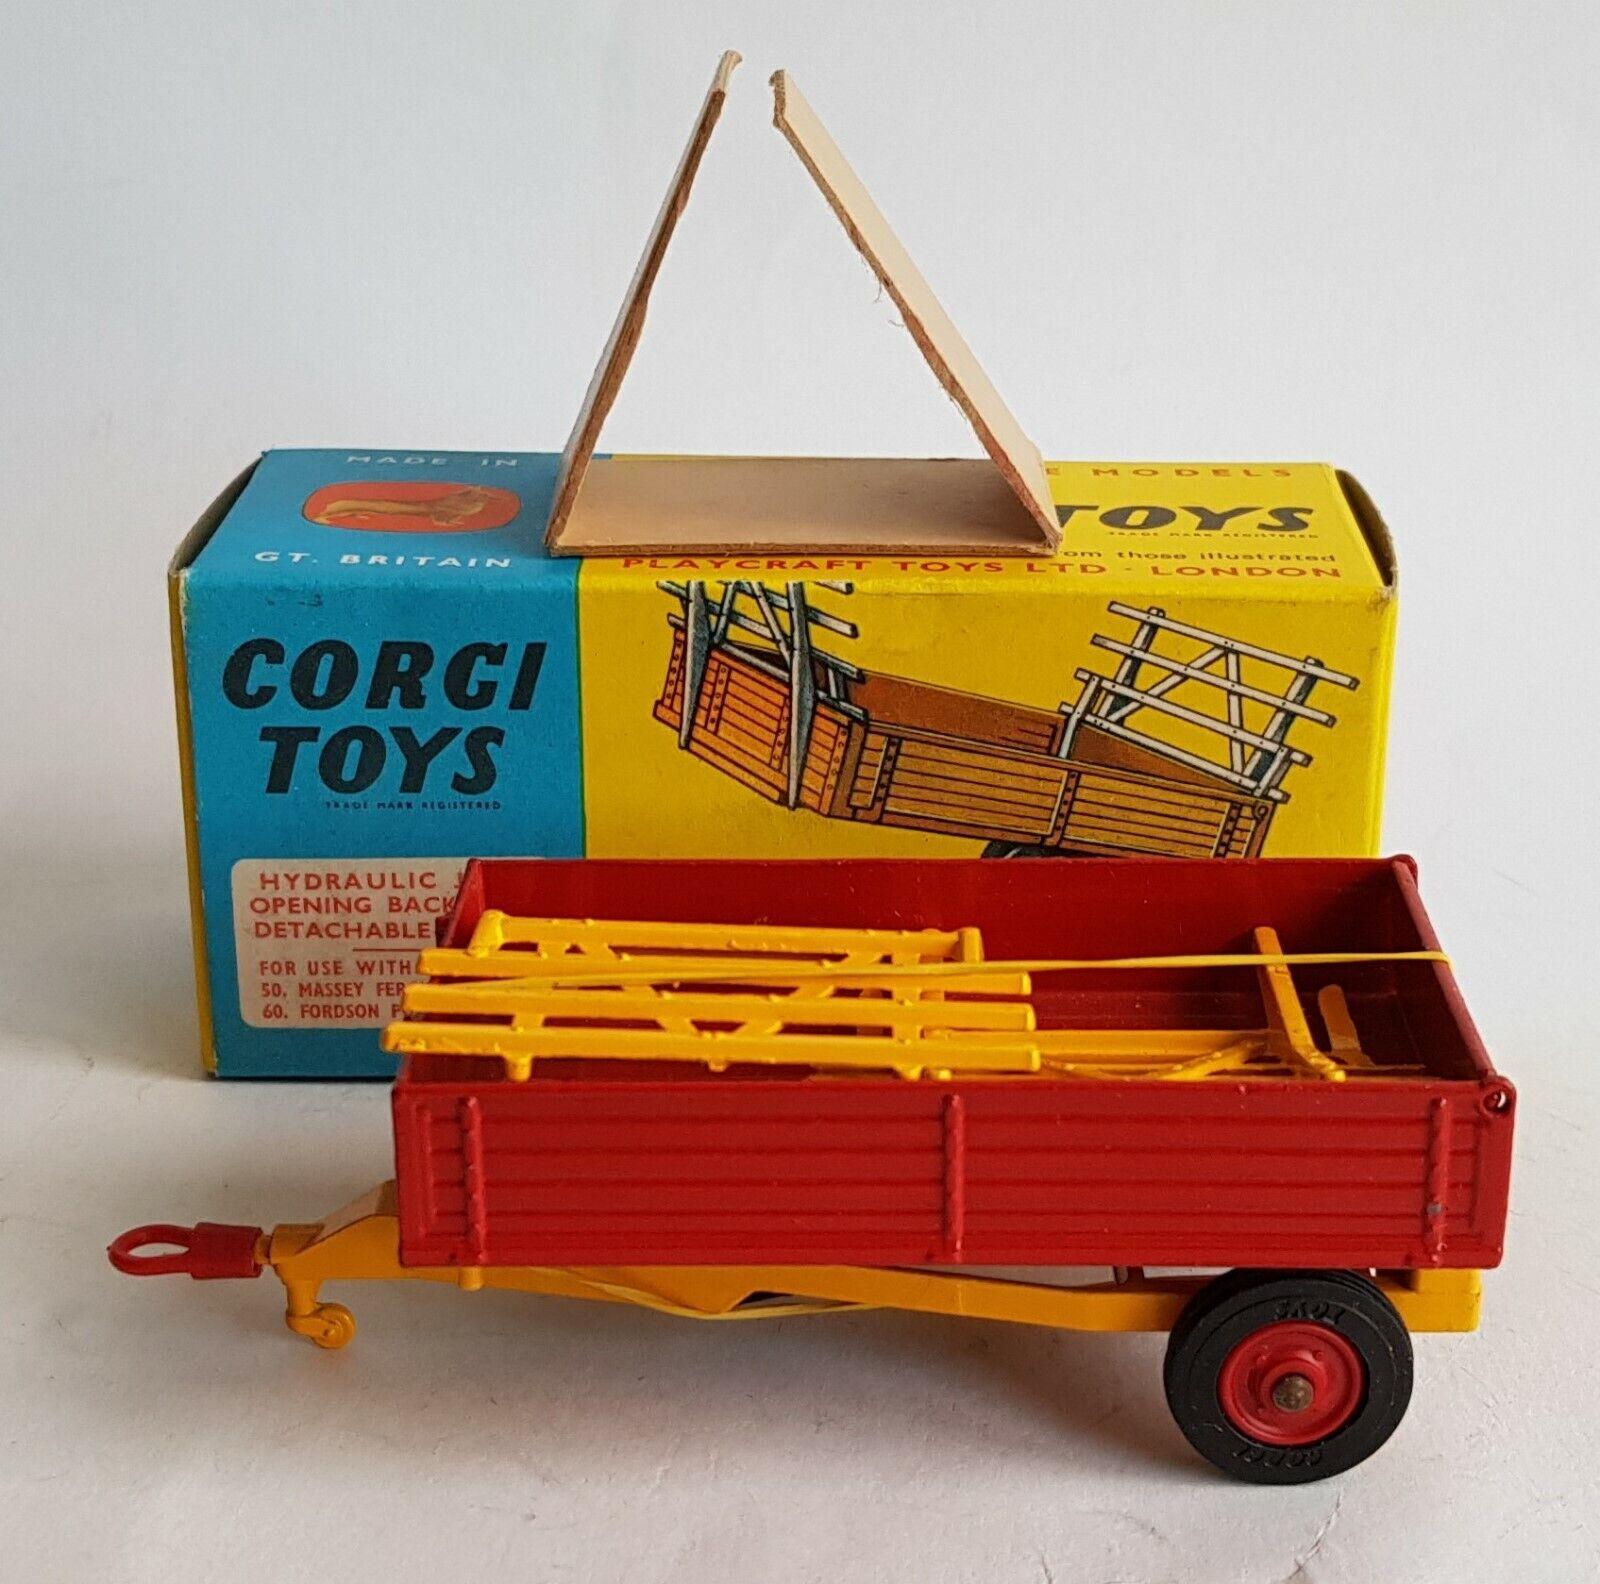 Corgi Toys 62, Farm Tipper Trailer, with Plastic Hook, - Superb Mint Condition.